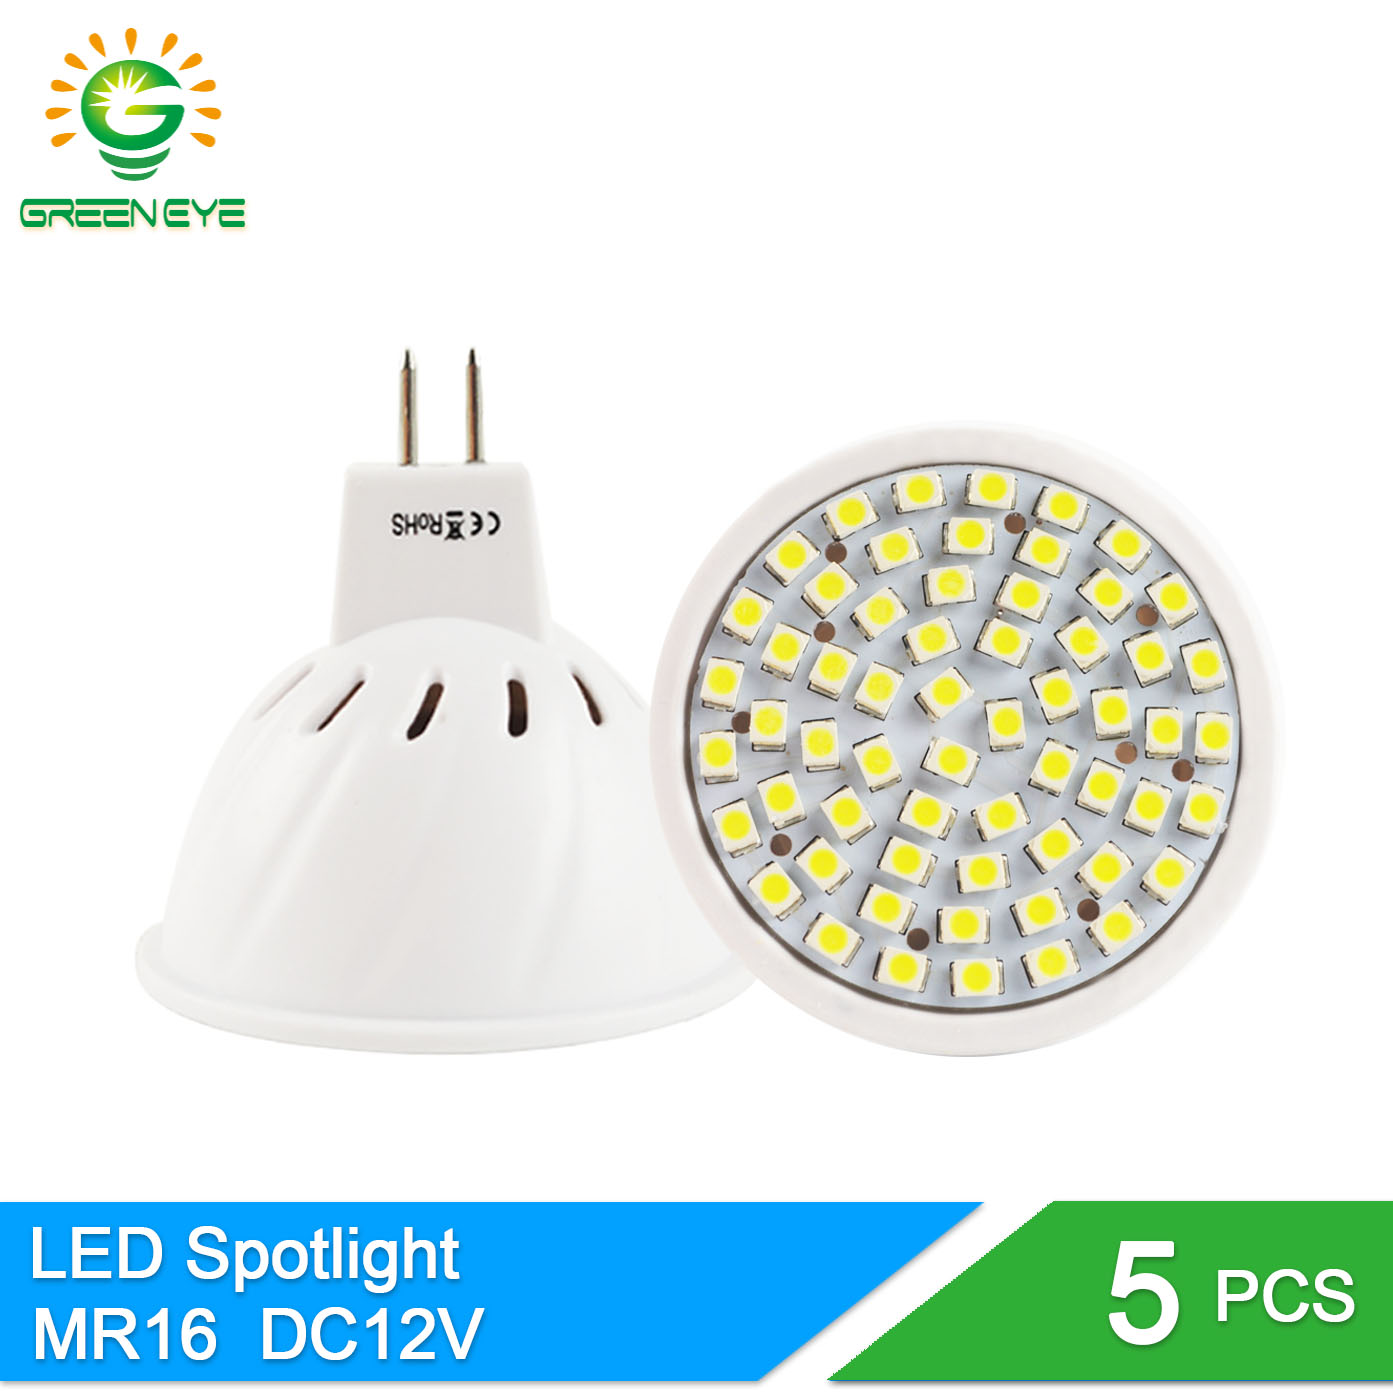 GreenEye 5Pcs High Bright MR16 220V DC 12V LED Lamp 6W 8W LED Spotlight Bombillas Spot Light Lampada LED Bulb Lampara Ampoule nouveau haute puissance lampada led mr16 cob 6 w 9 w 12 w dimmable led cob spotlight chaud blanc froid mr16 12 v ampoule